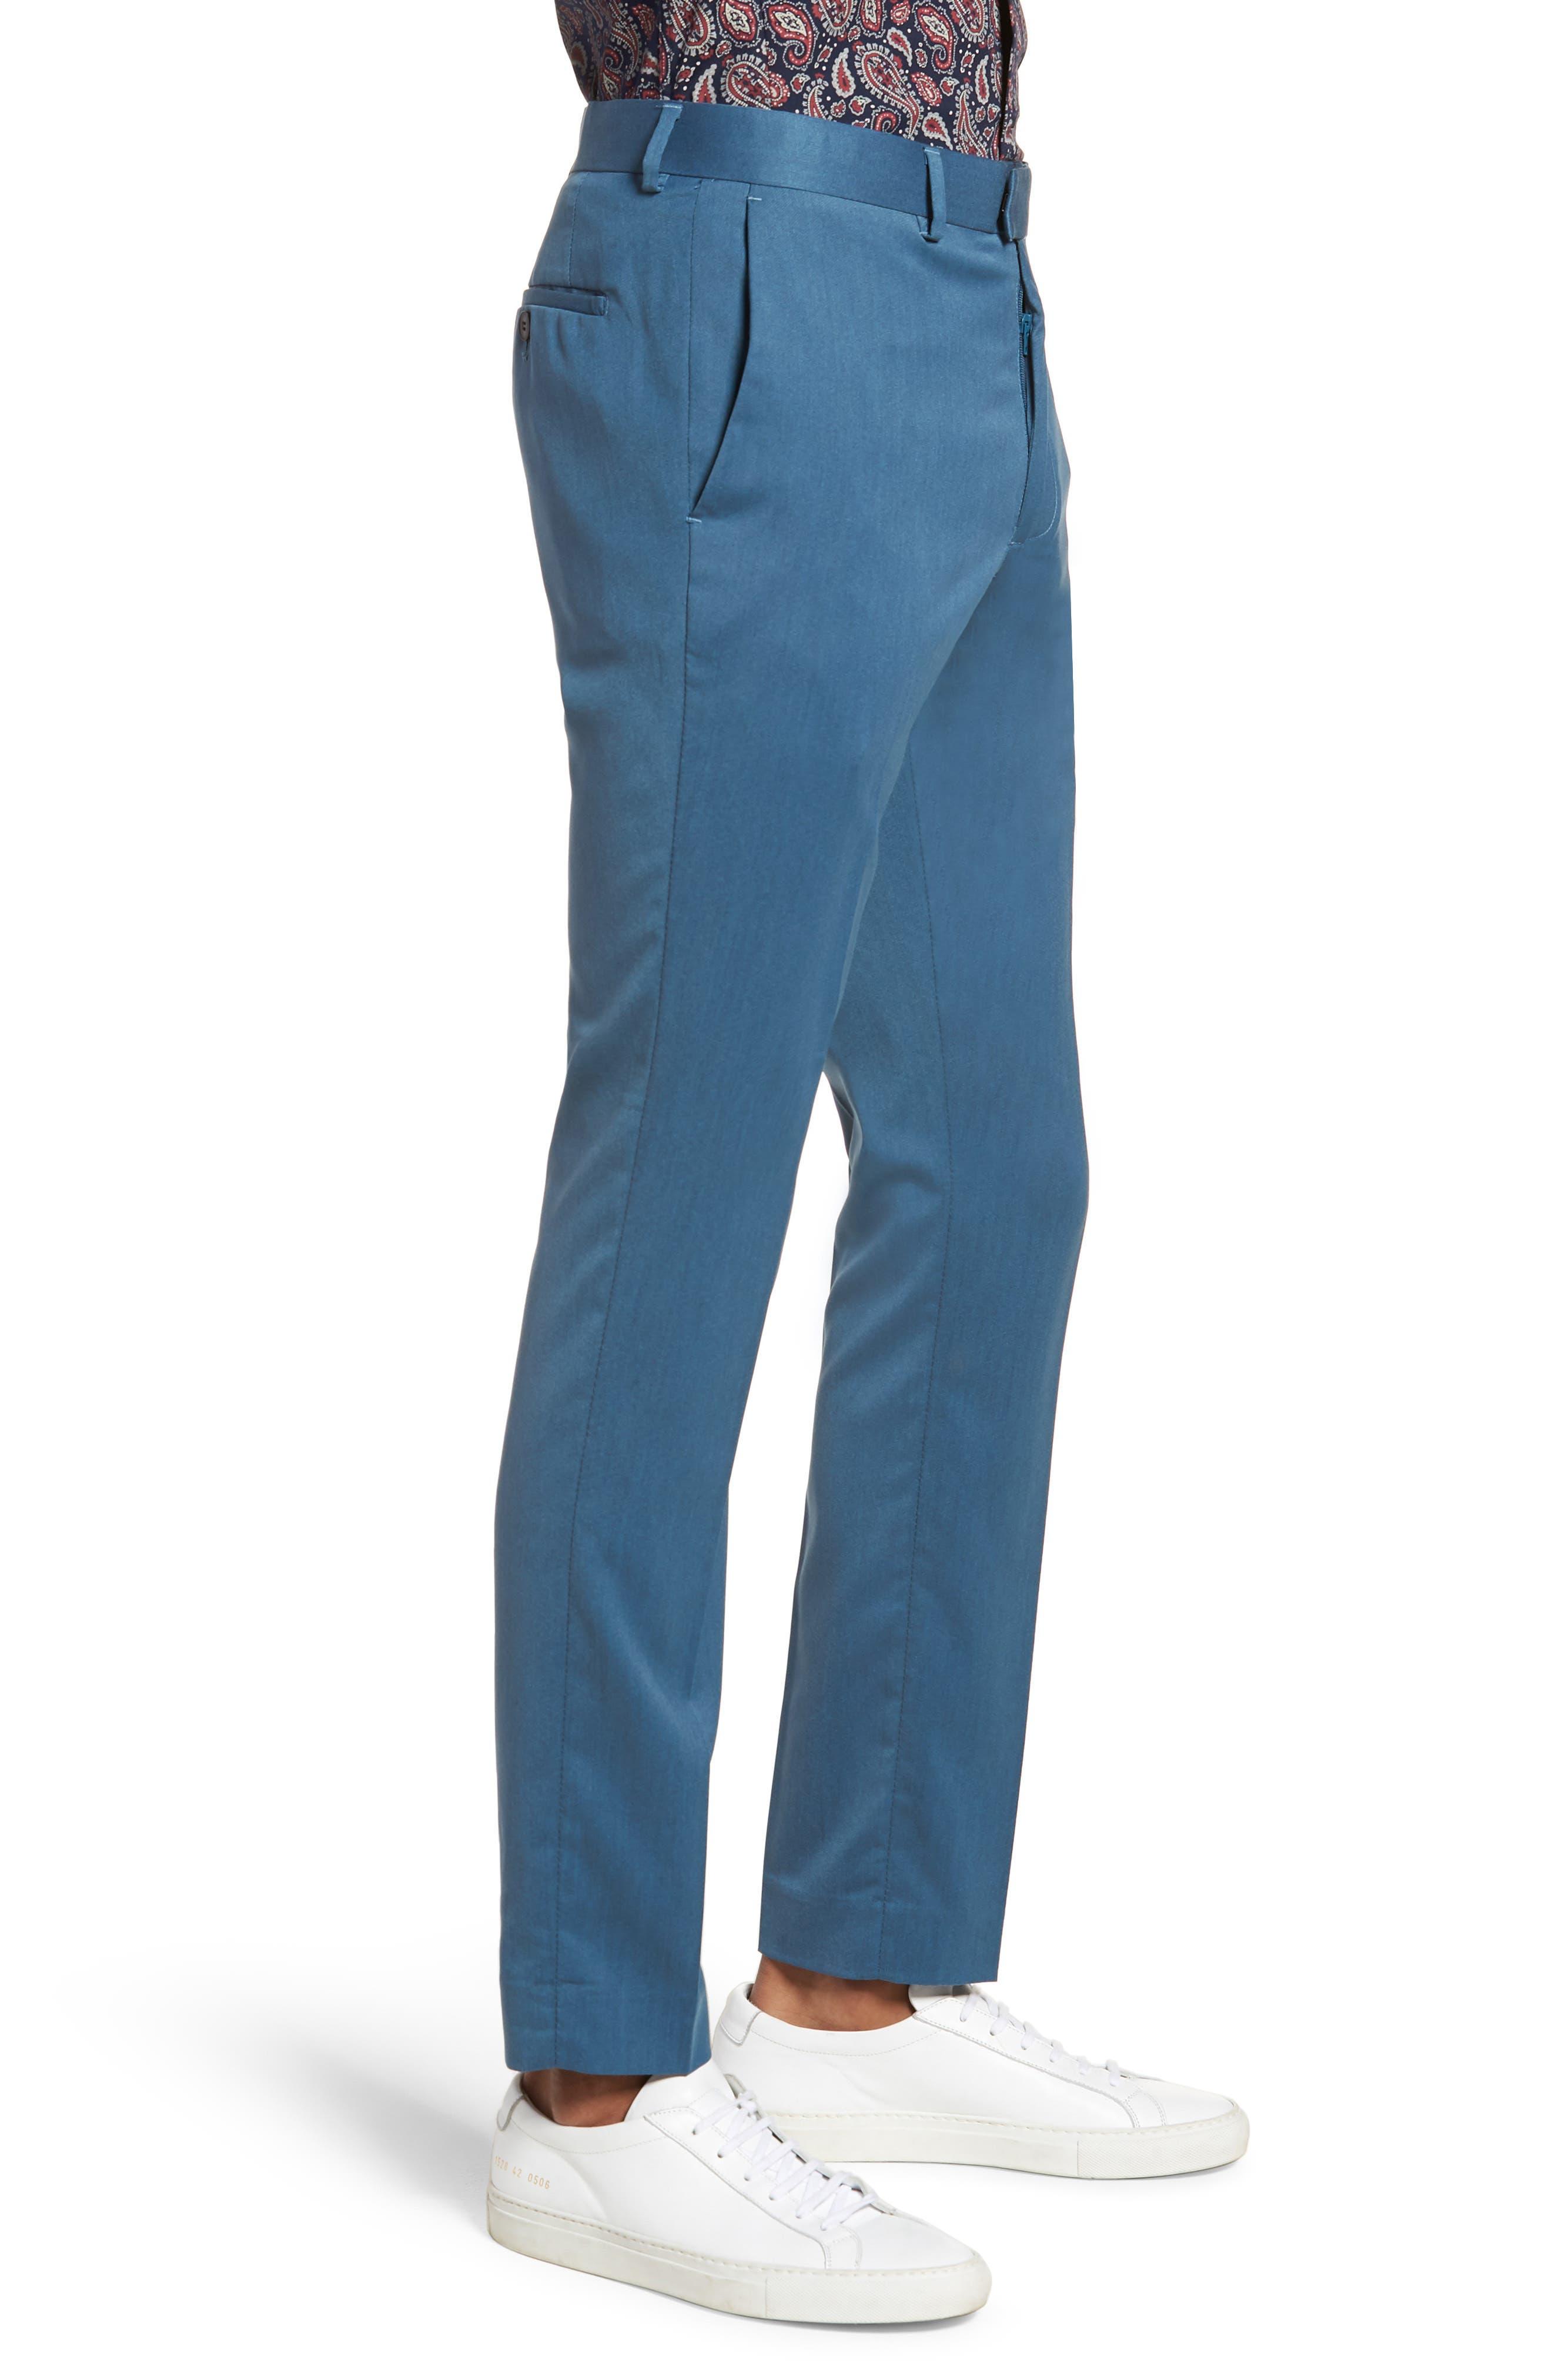 Skinny Fit Suit Trousers,                             Alternate thumbnail 3, color,                             Light Blue